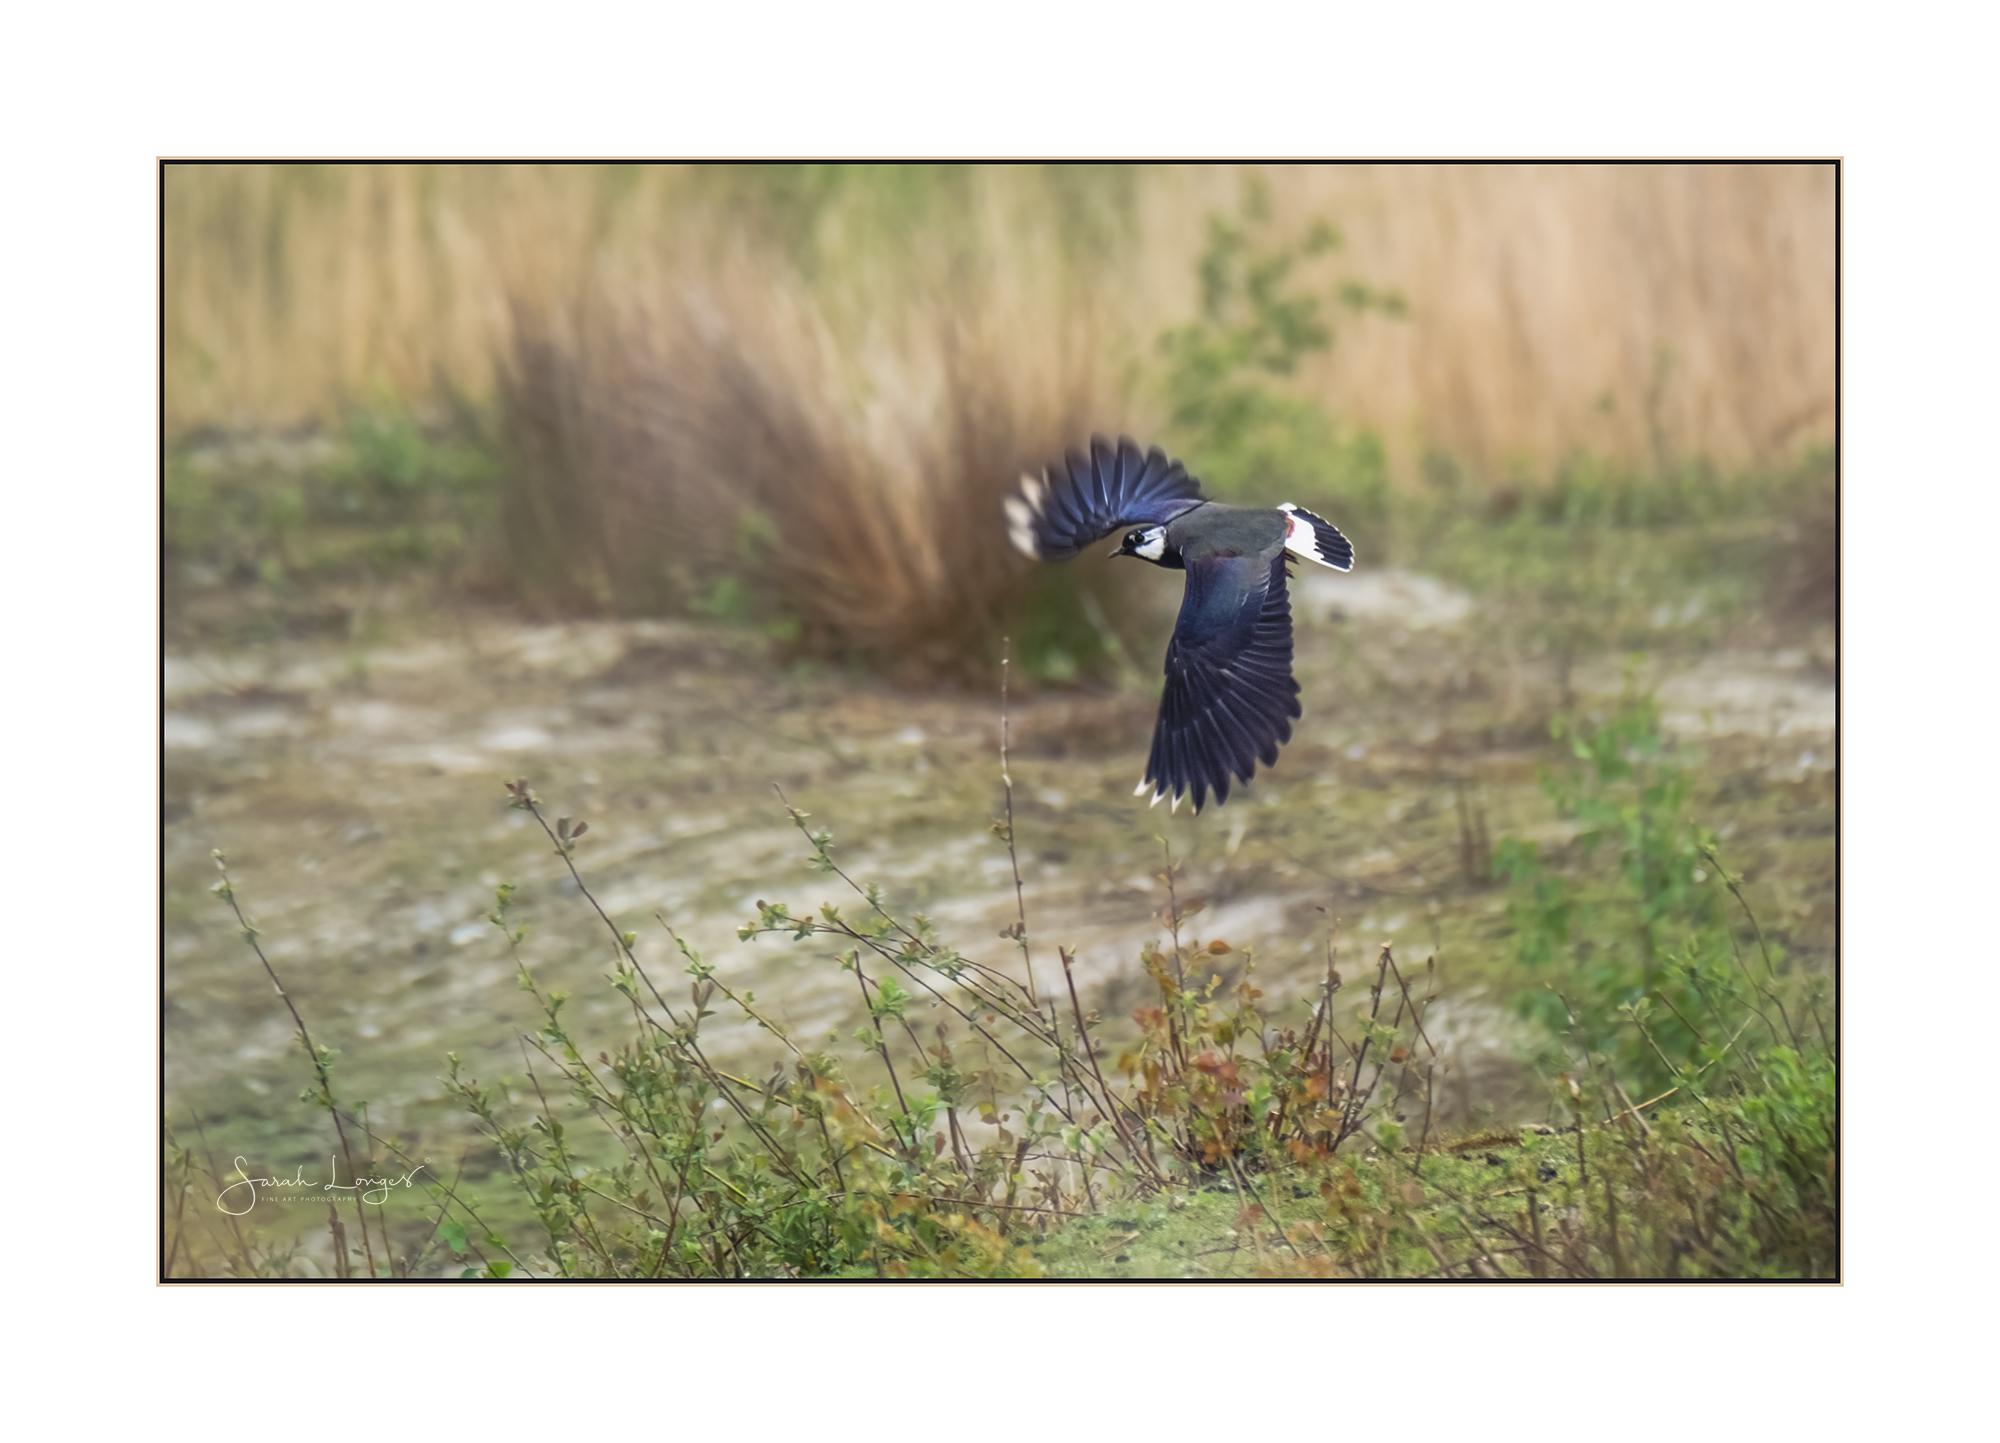 Lapwing in flight at Heather Farm